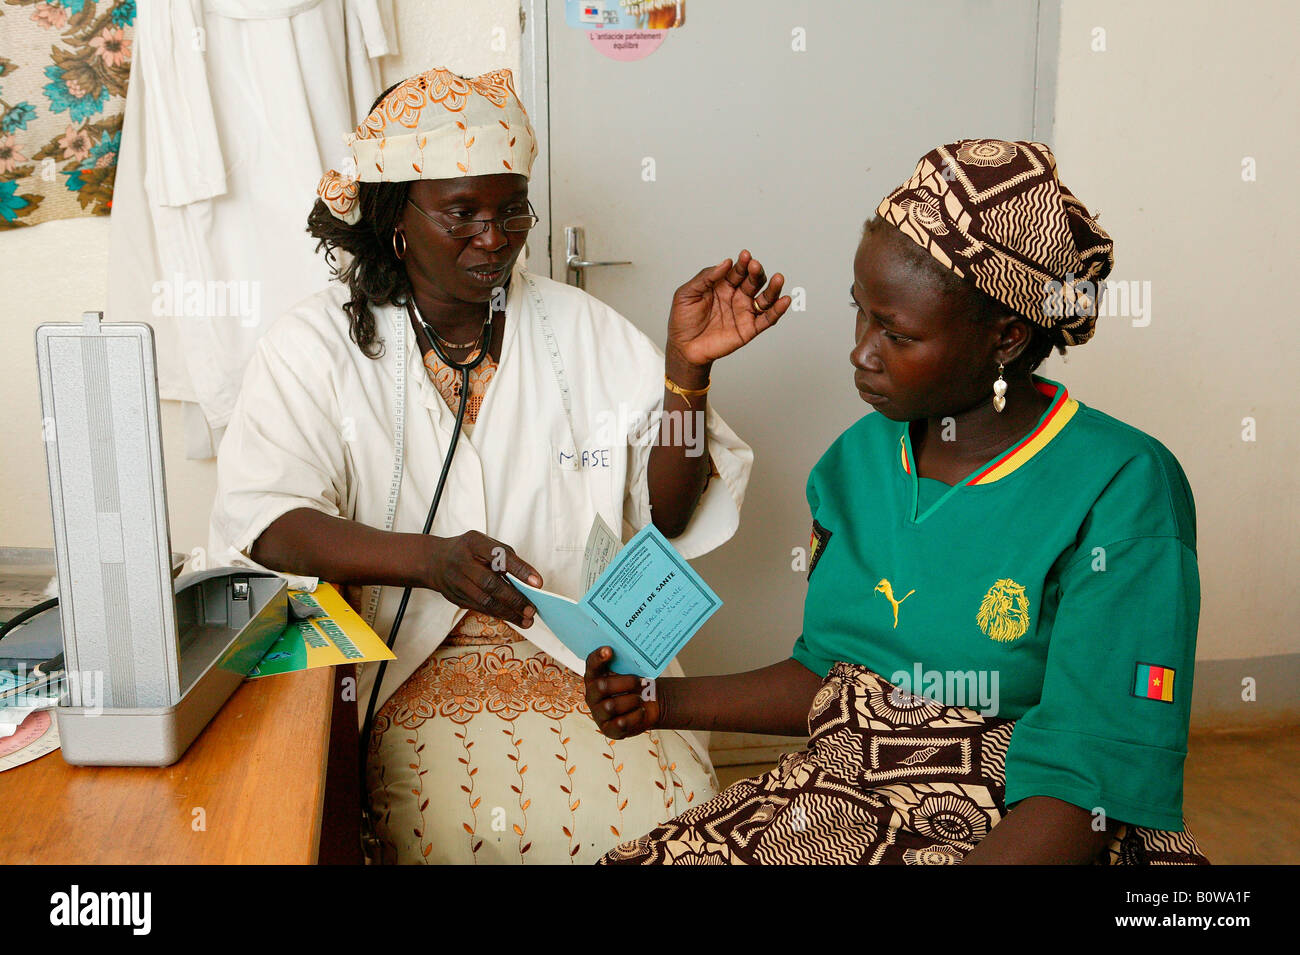 Female doctor examining a woman, prenatal testing, Garoua, Cameroon, Africa - Stock Image